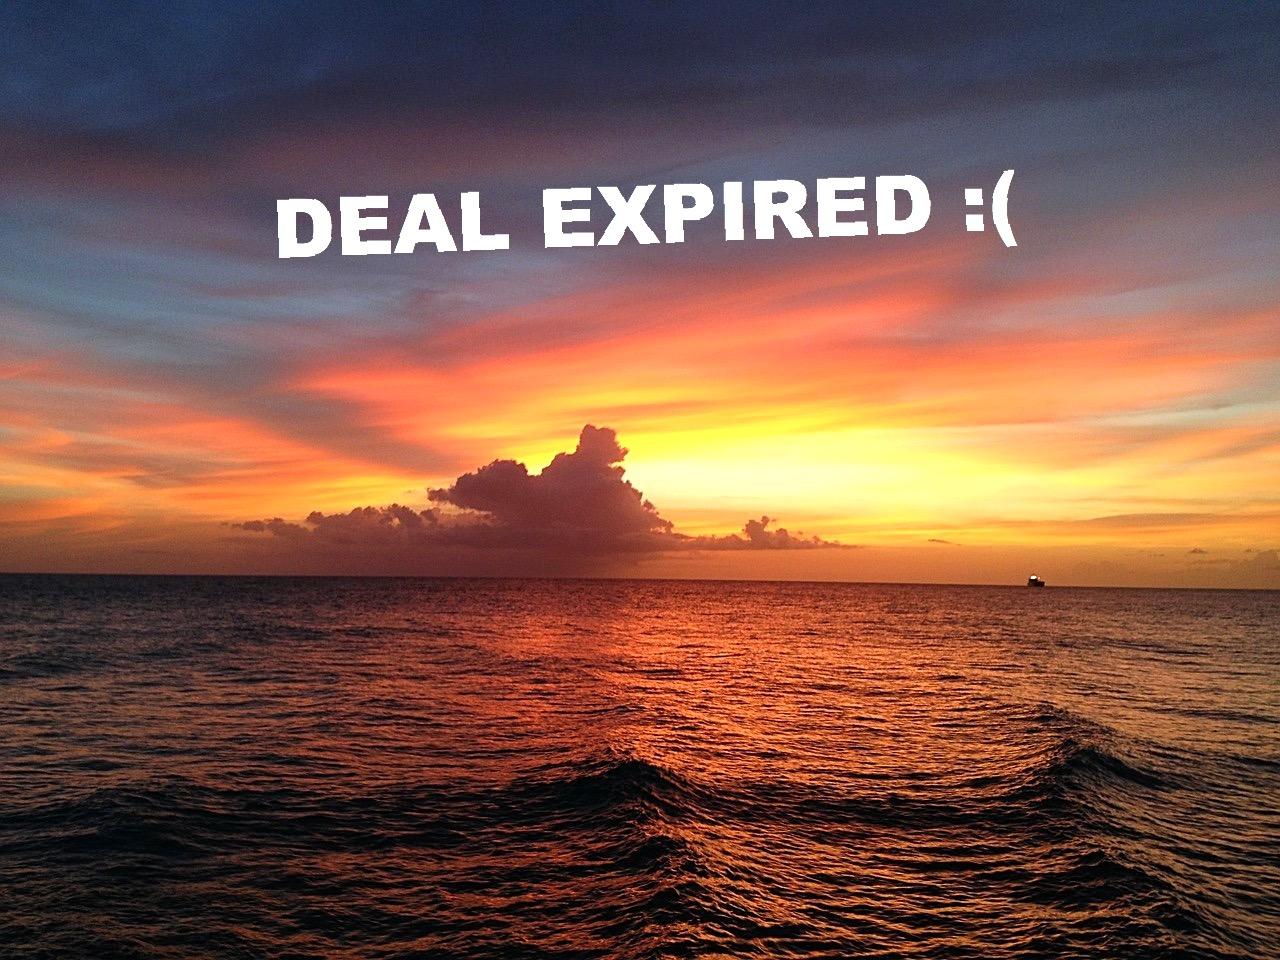 sunset-91936_1280_edited_edited